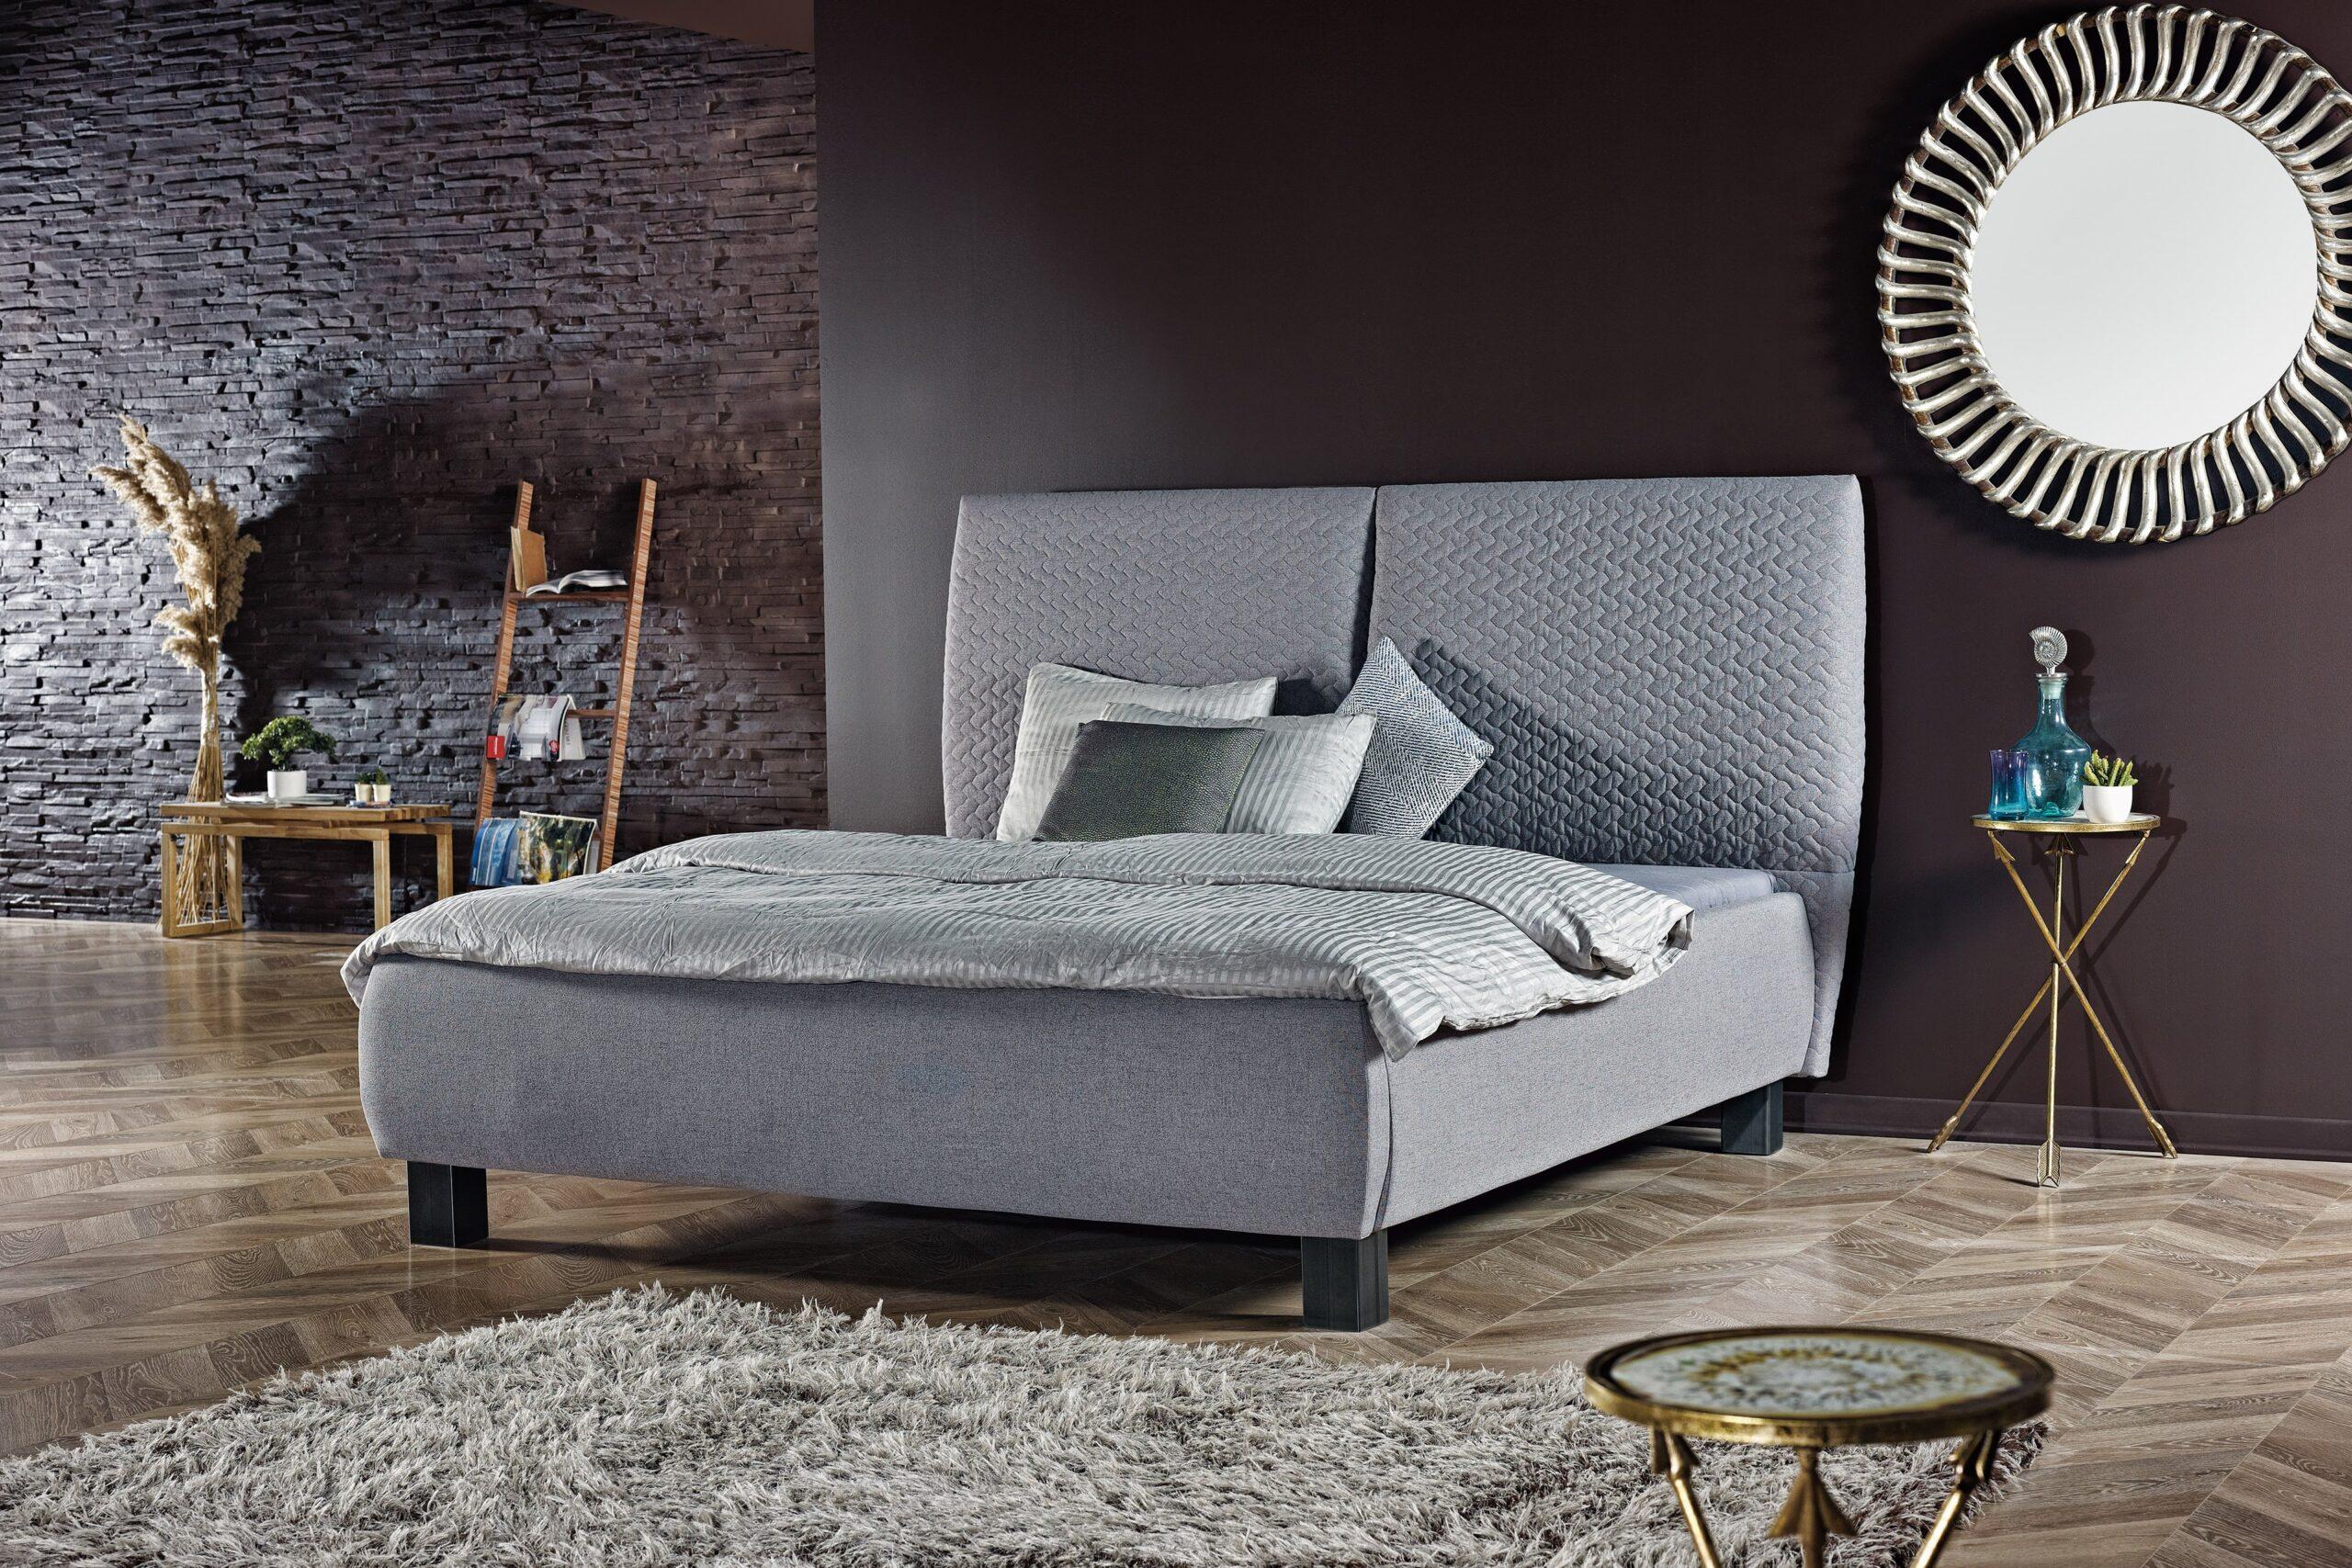 Full Size of Polsterbett 200x220 Bed Bo2010 Grau Mbel Letz Ihr Online Shop Bett Betten Wohnzimmer Polsterbett 200x220